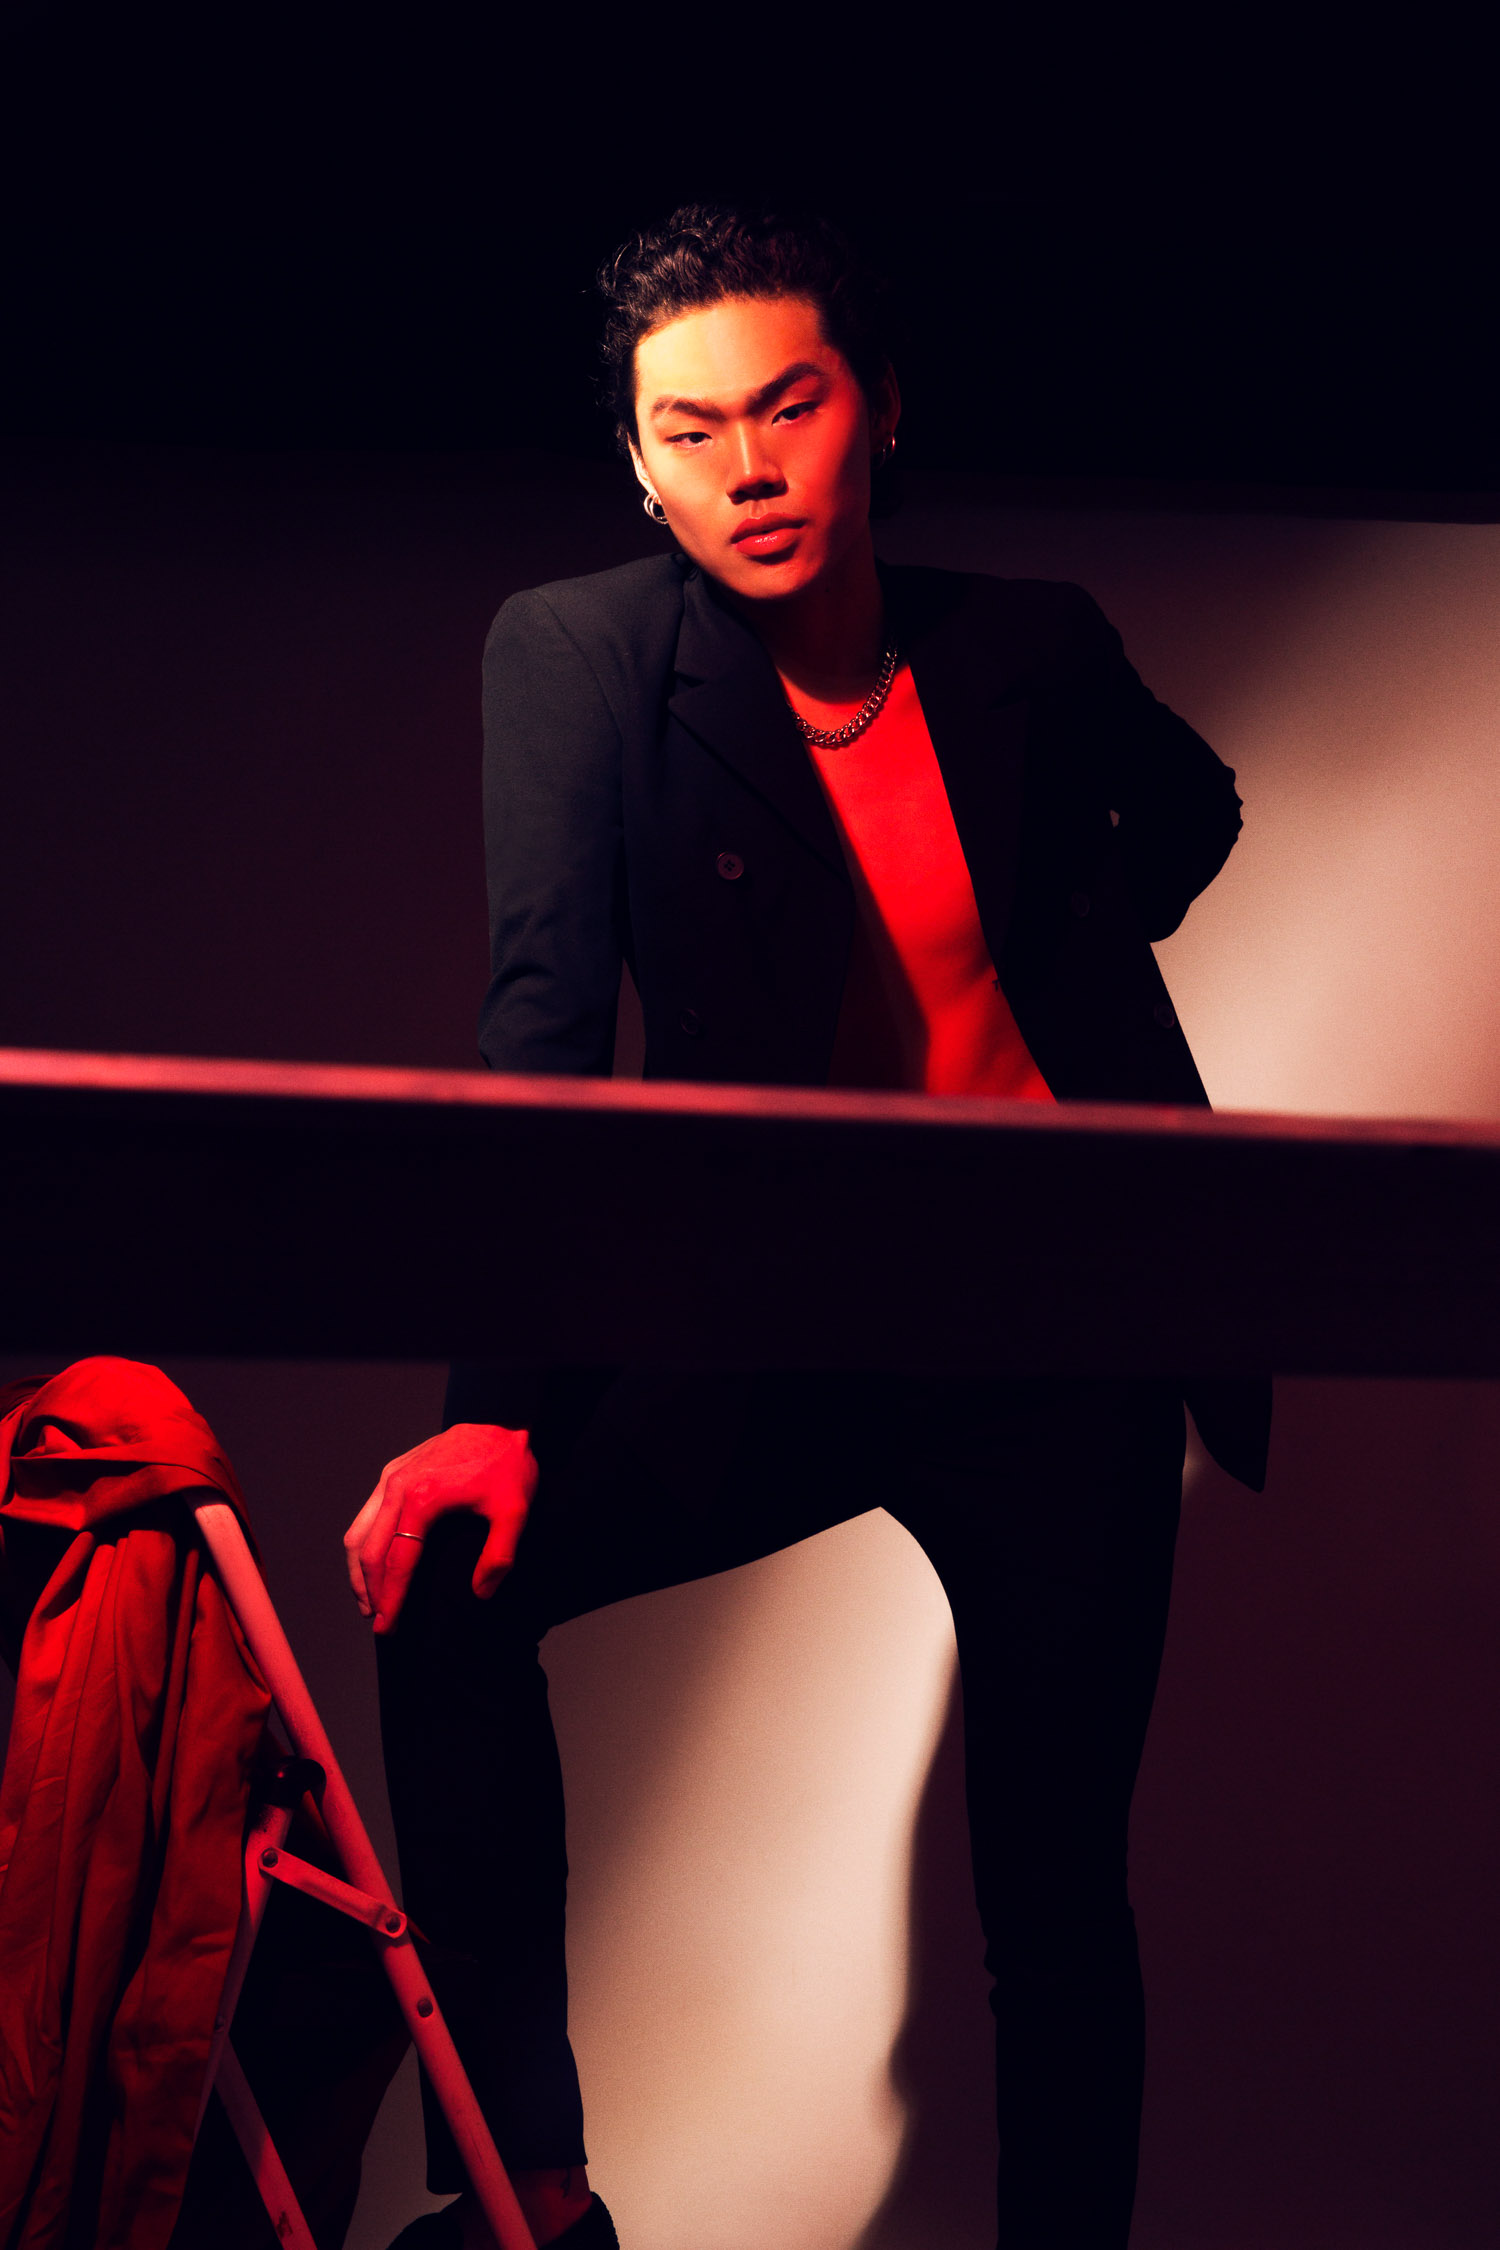 Portrait of an asian model in red light.